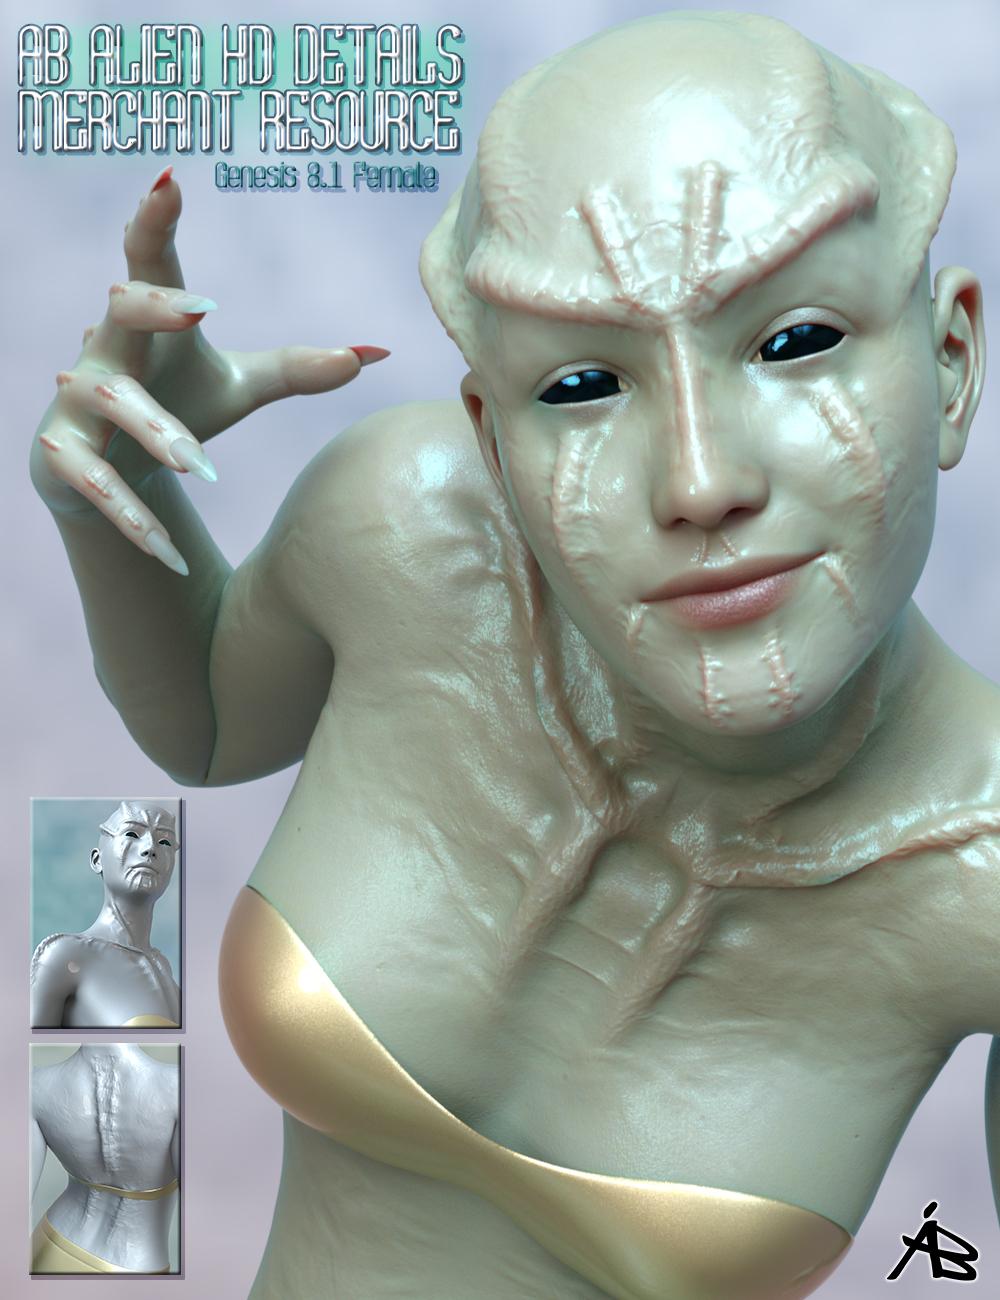 AB Alien HD Details for Genesis 8.1 Female Merchant Resource by: AuraBianca, 3D Models by Daz 3D